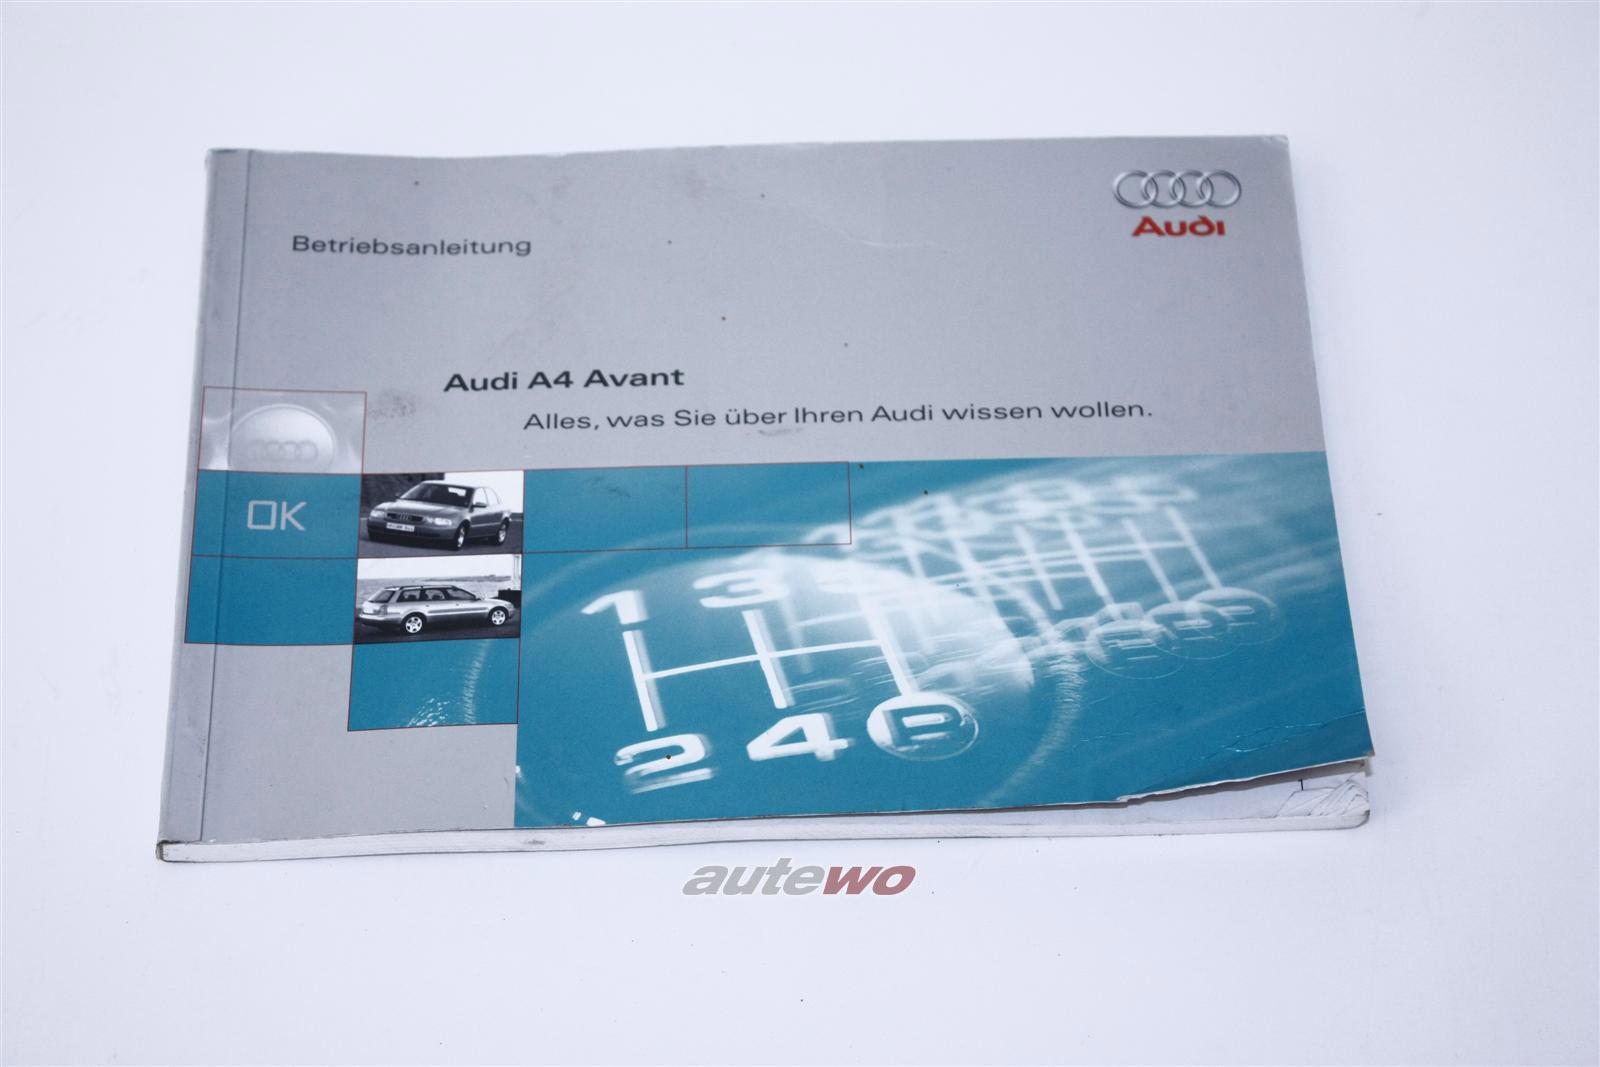 Audi A4 B5 Avant Betriebsanleitung Ausgabe 12/1995